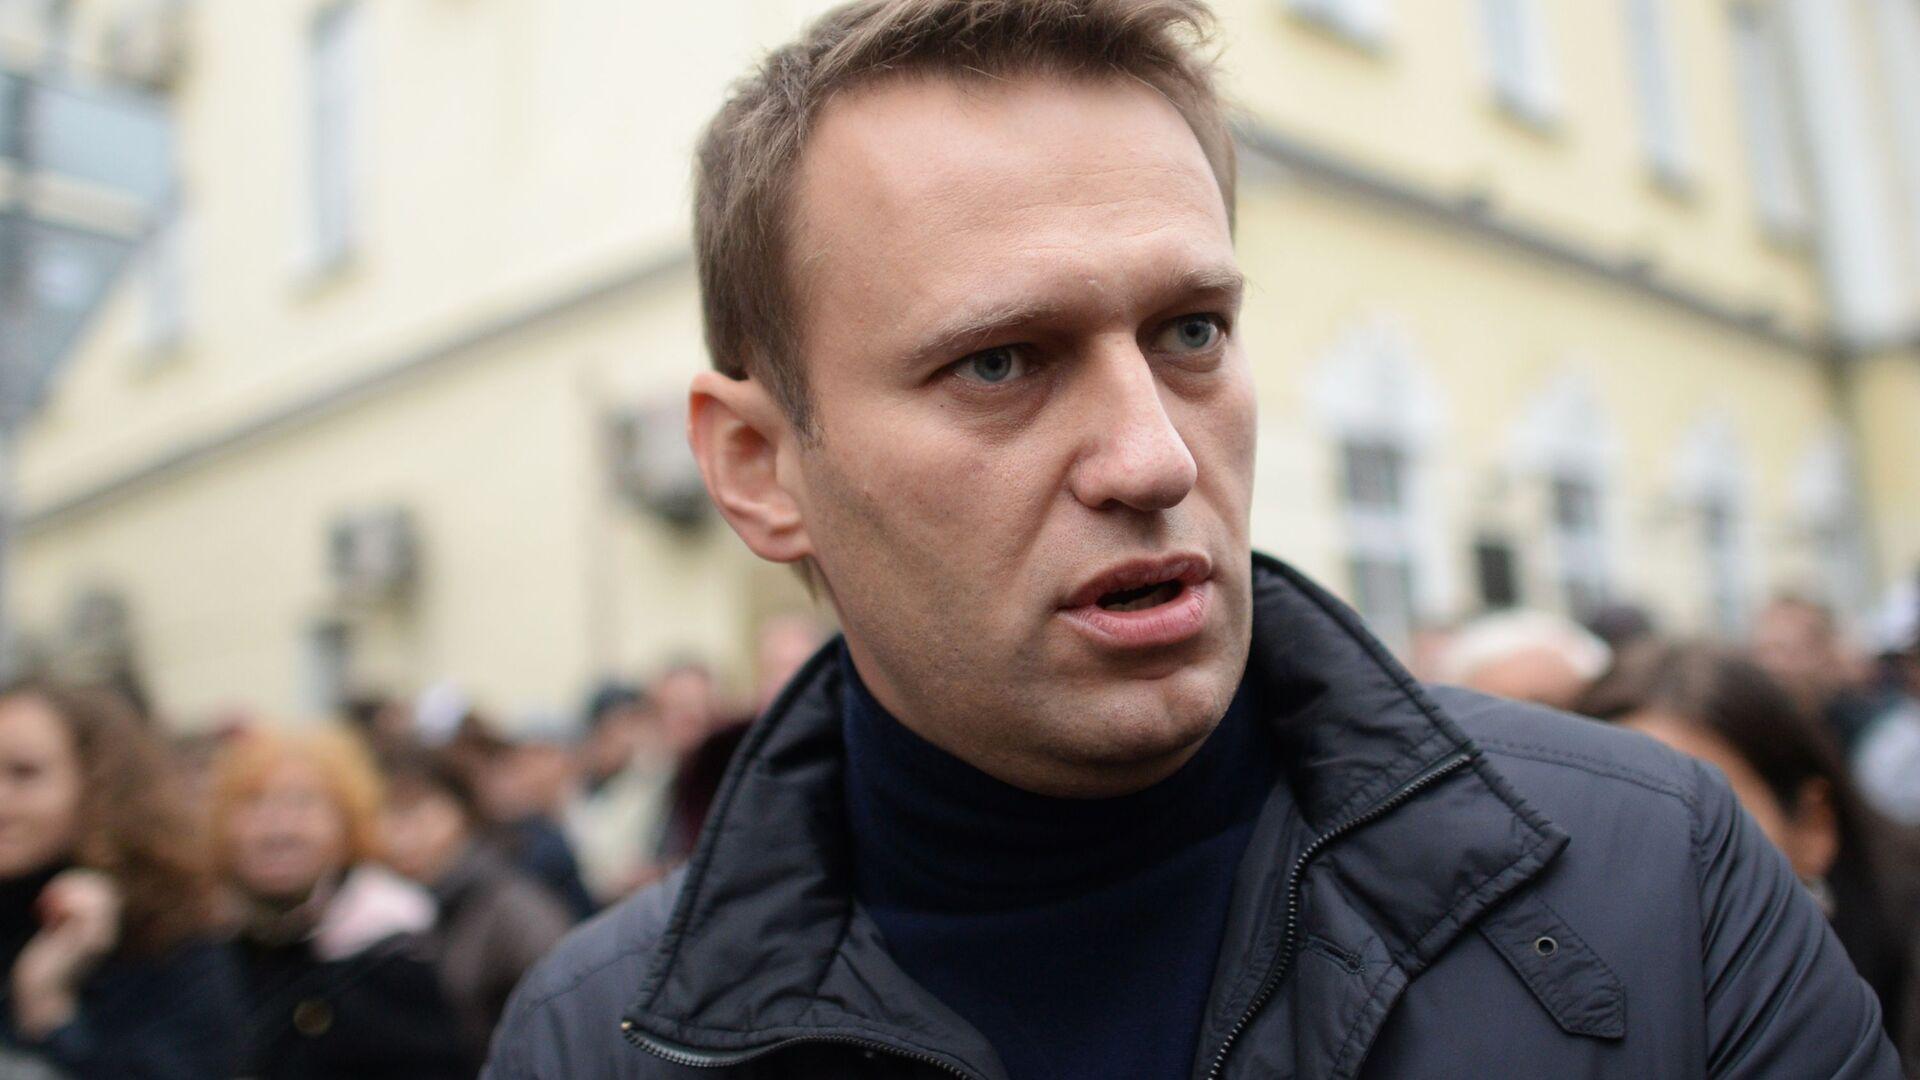 Alexej Navalnyj - Sputnik Česká republika, 1920, 26.02.2021